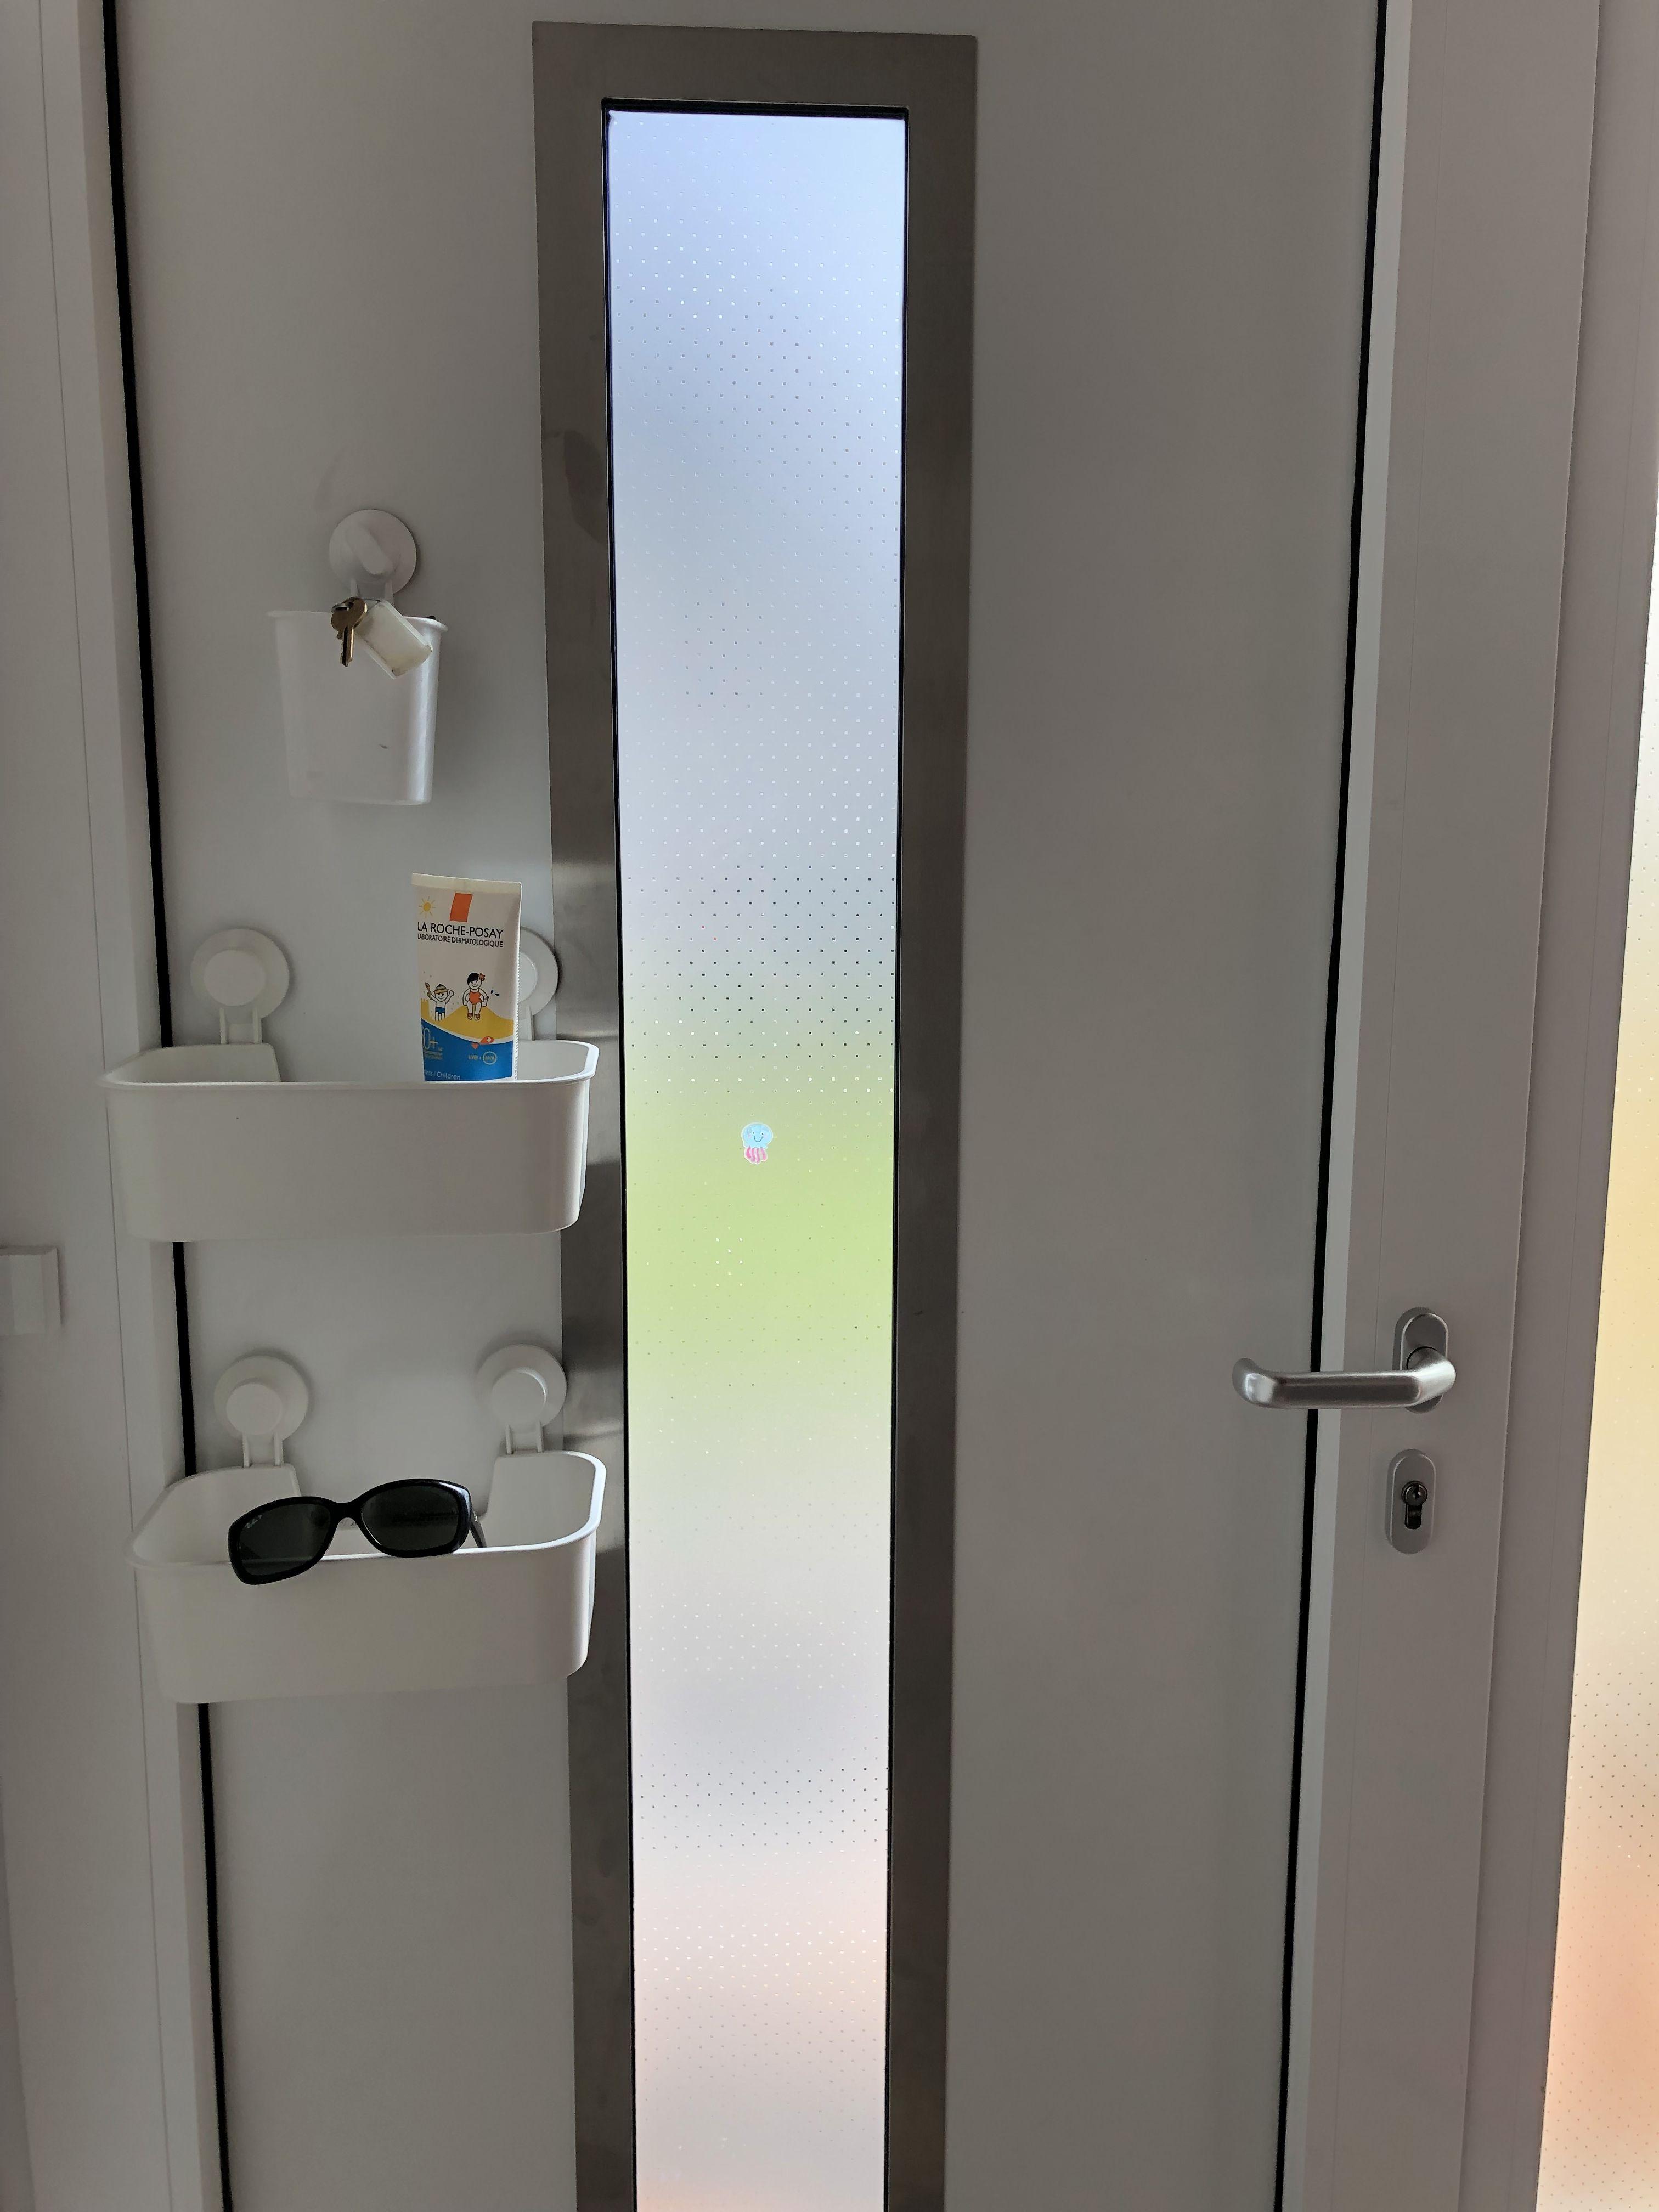 Ikea Hack Tisken Organised Mum With Images Locker Storage